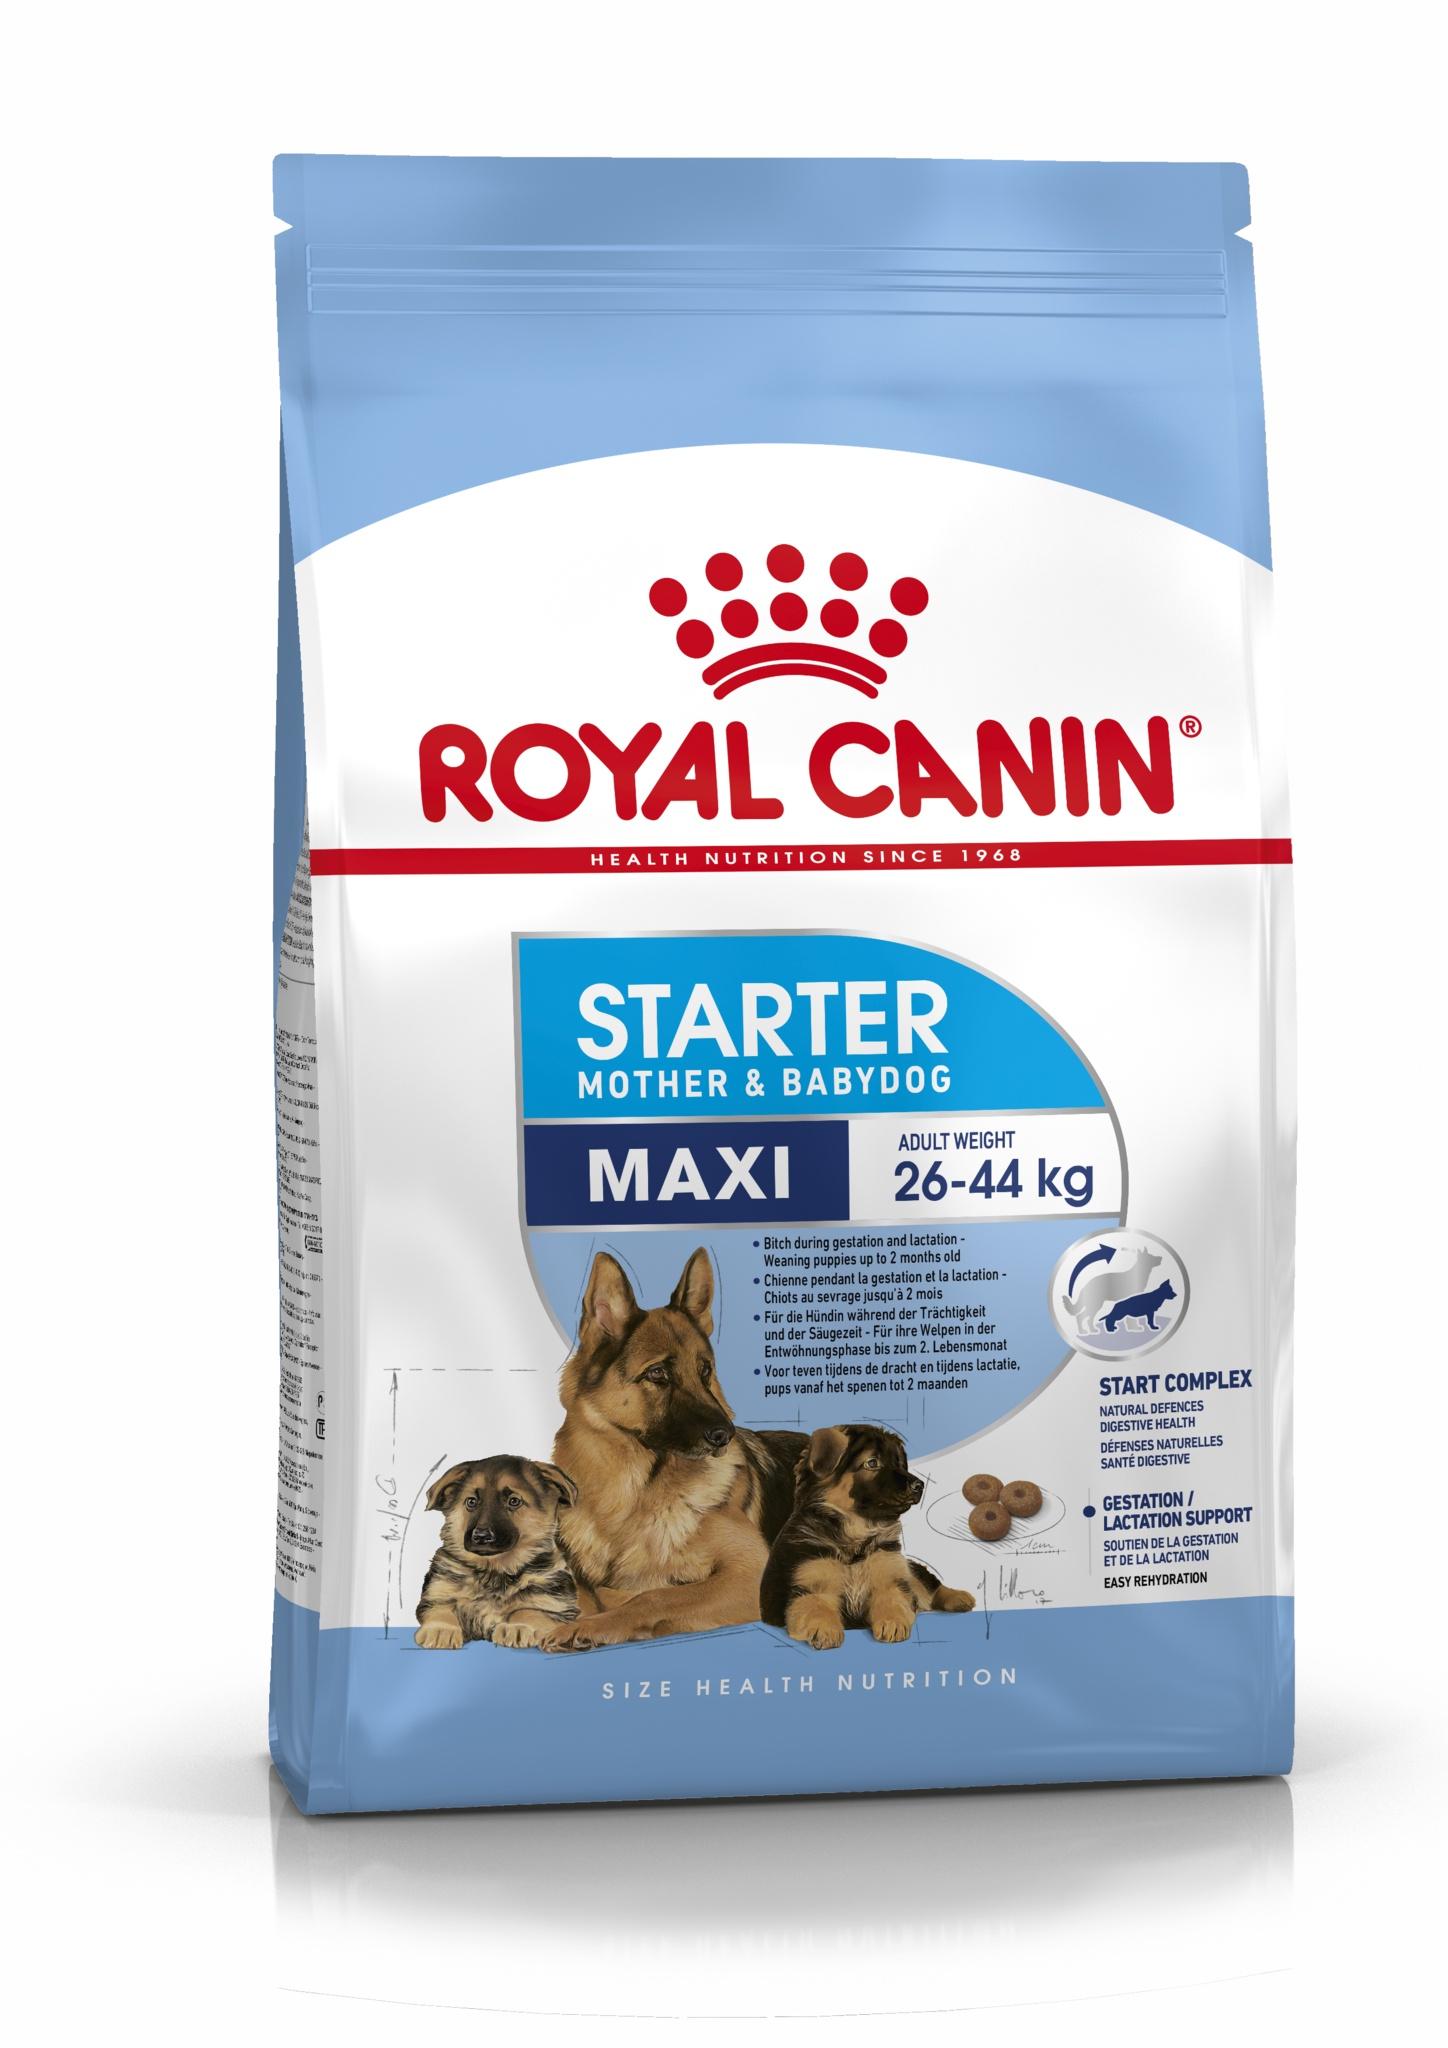 Royal Canin корм для щенков крупных пород до 2-х месяцев (15 кг) royal canin корм для щенков крупных пород 3 кг